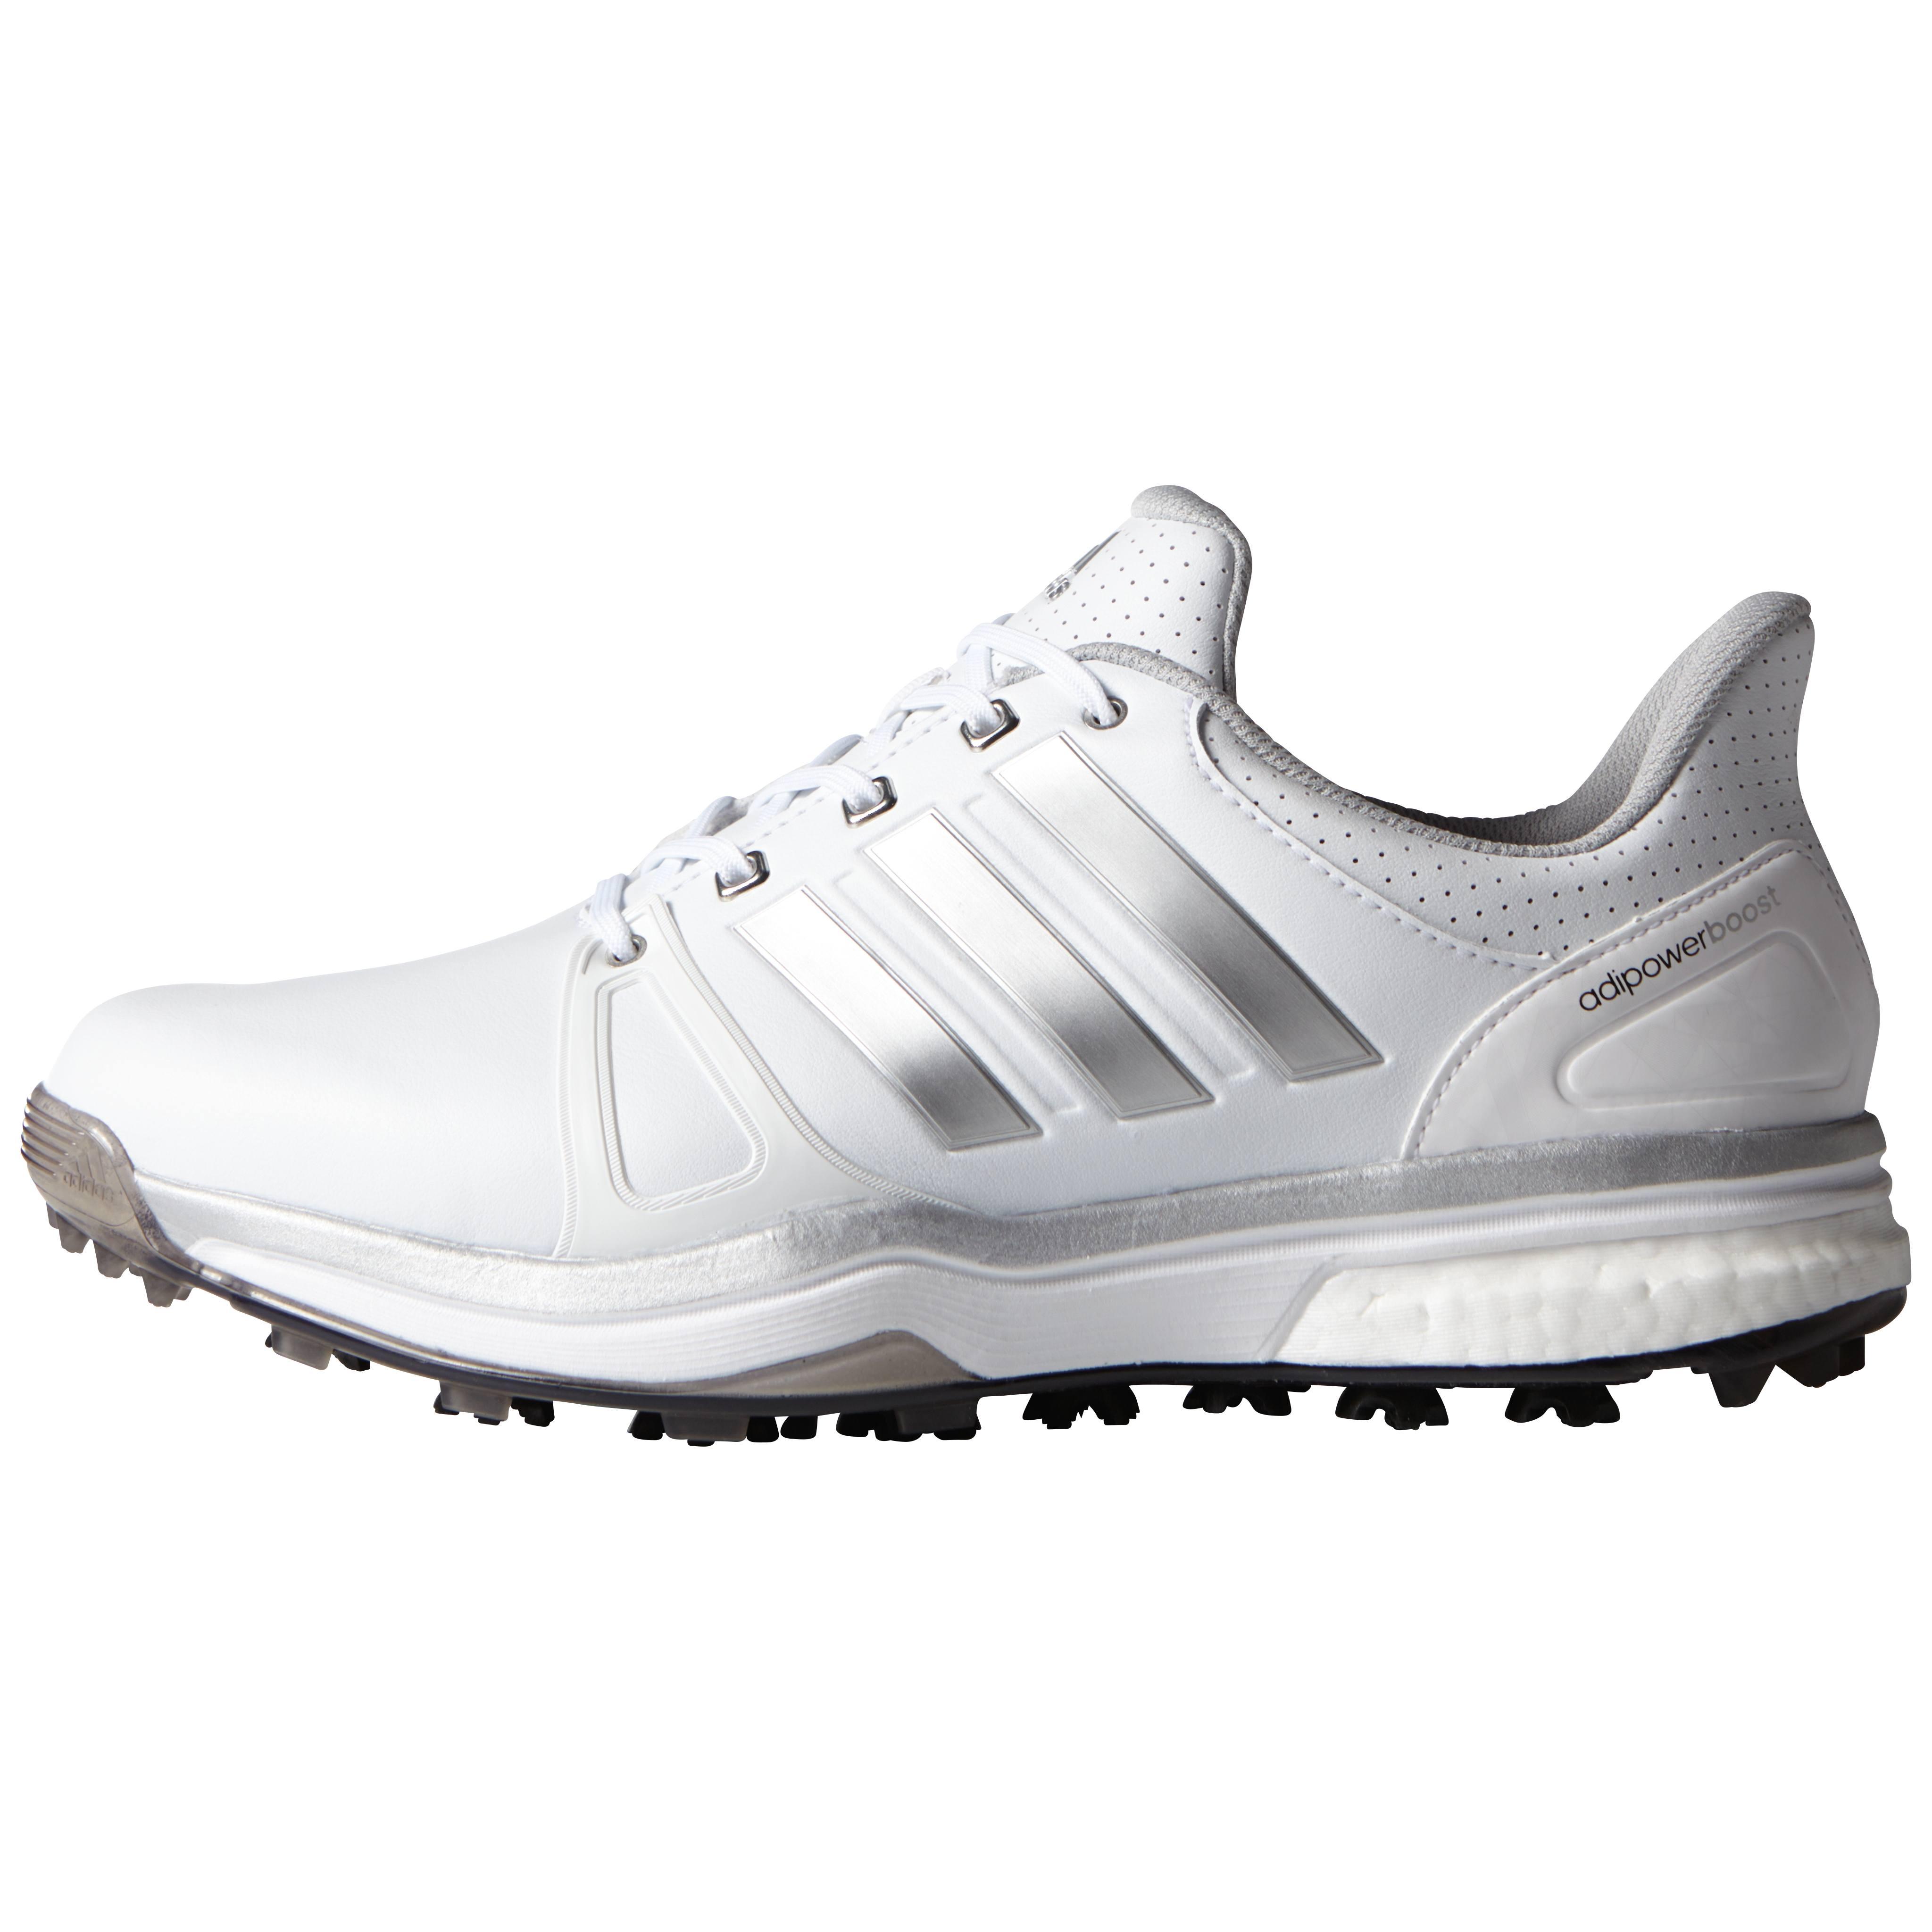 e0a7b8604 Adidas Adipower Boost 2 Shoes